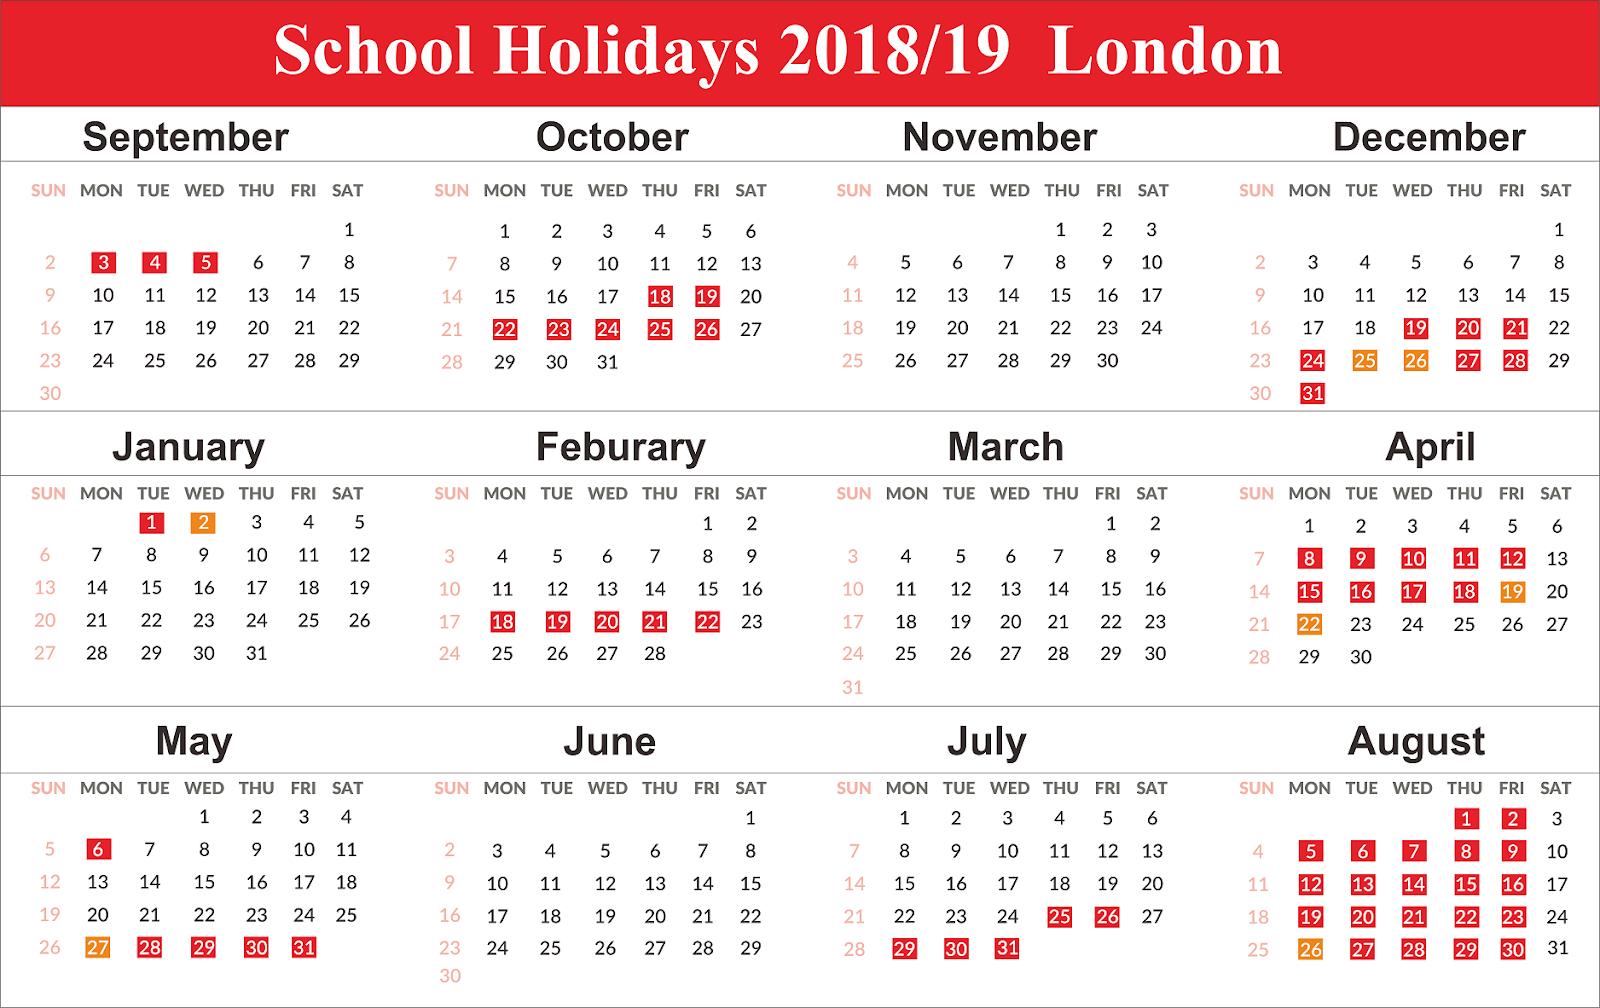 School Holidays 2019 London Calendar {Template} Calendar 2019 London